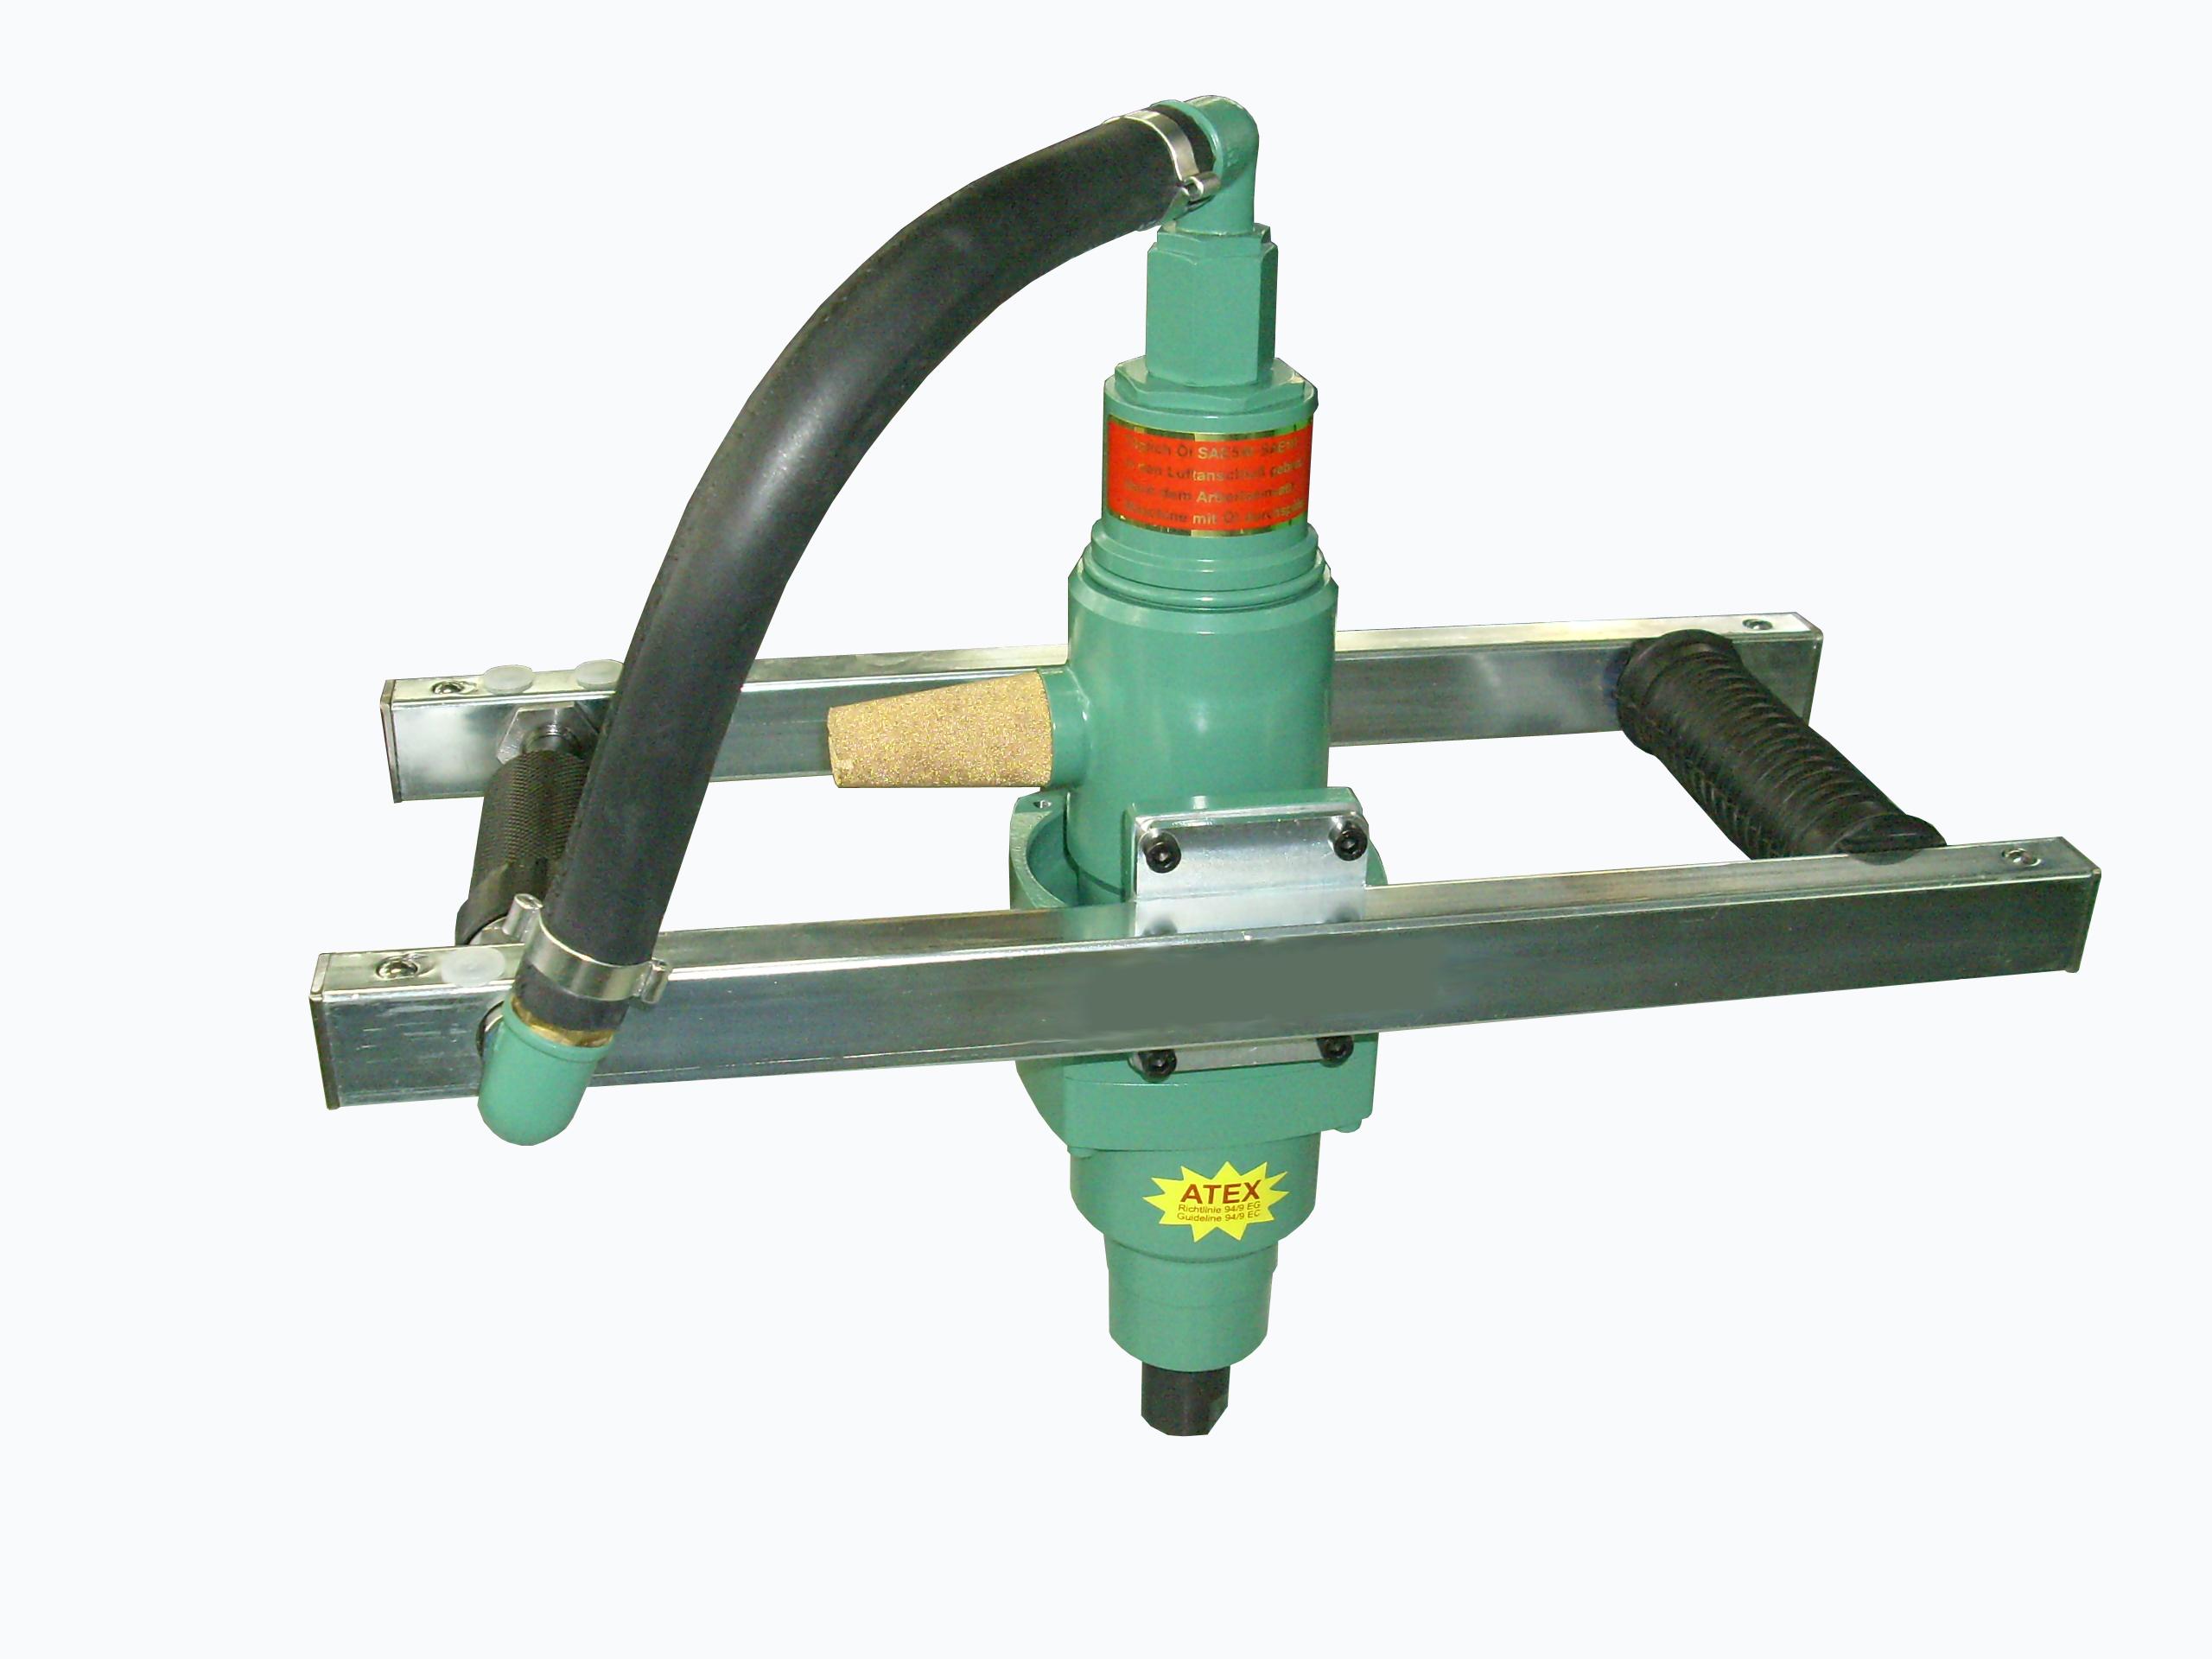 Druckluft-Rührwerk RMP 1100 ATEX I